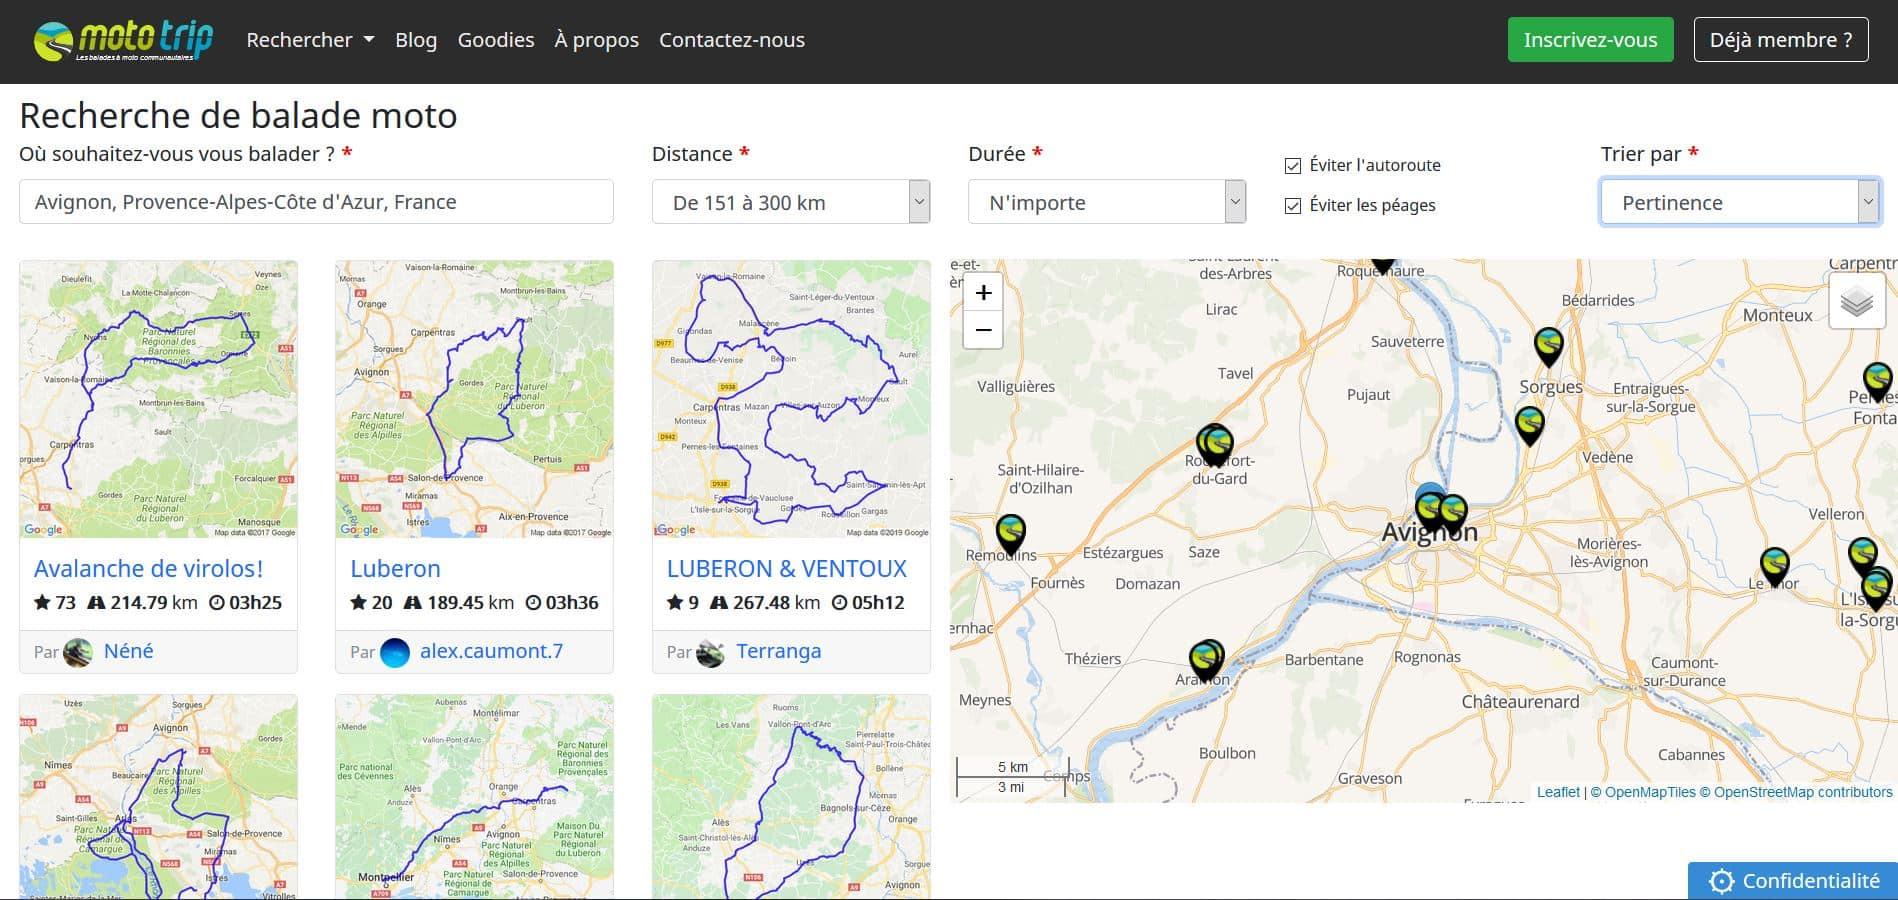 Moto-Trip site communautaire de balades moto